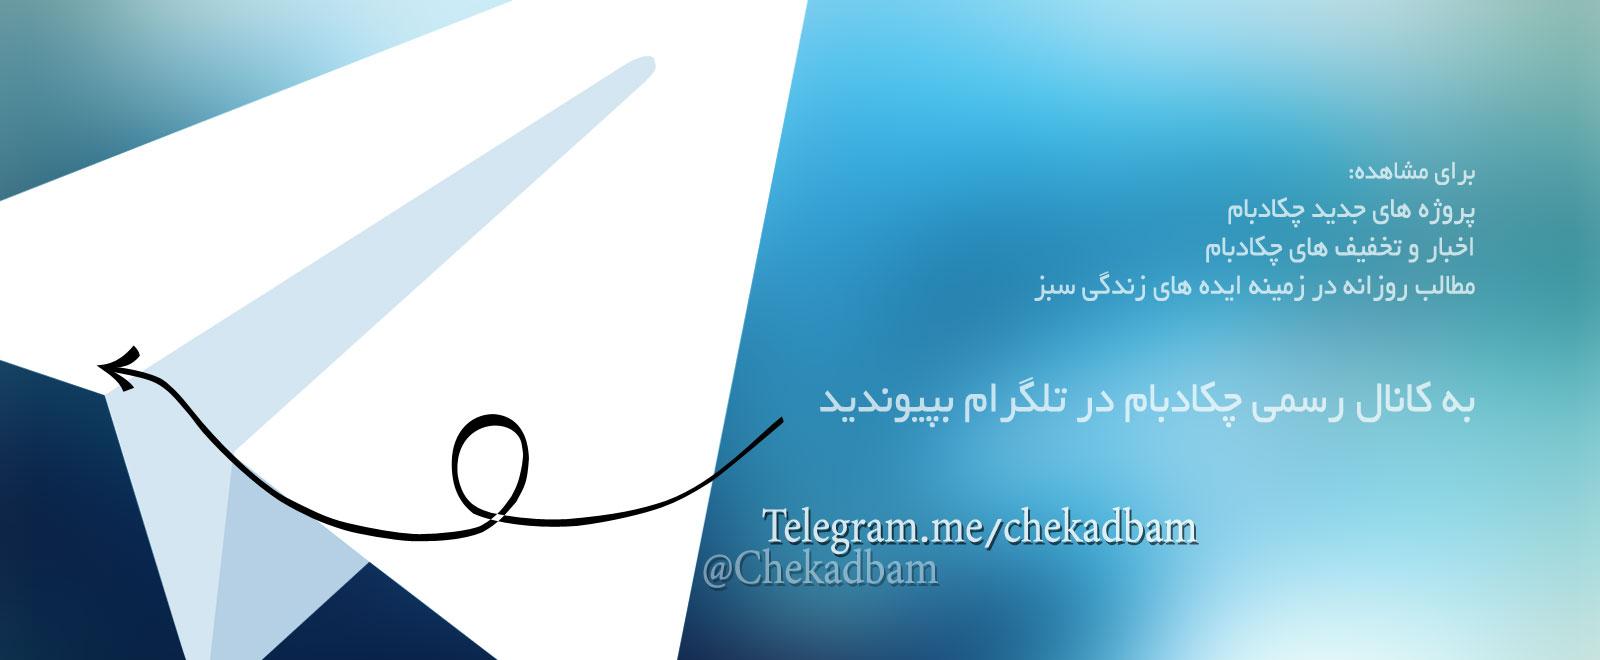 chekadbam official telegram channel company logo